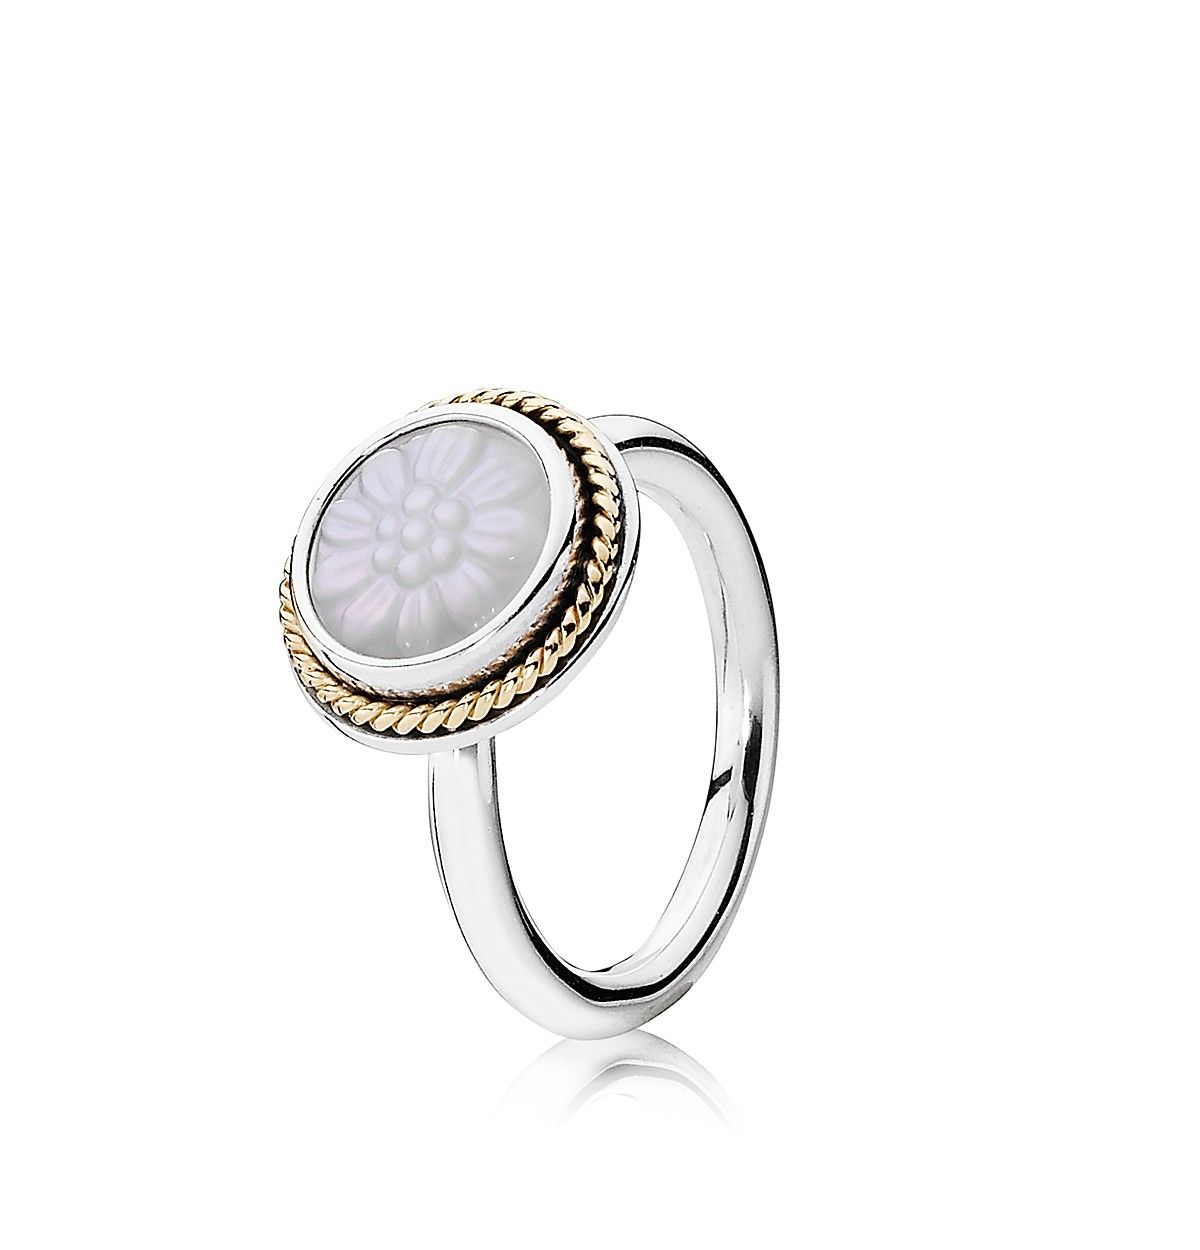 PANDORA Ring  Sterling Silver 14K Gold  MotherofPearl